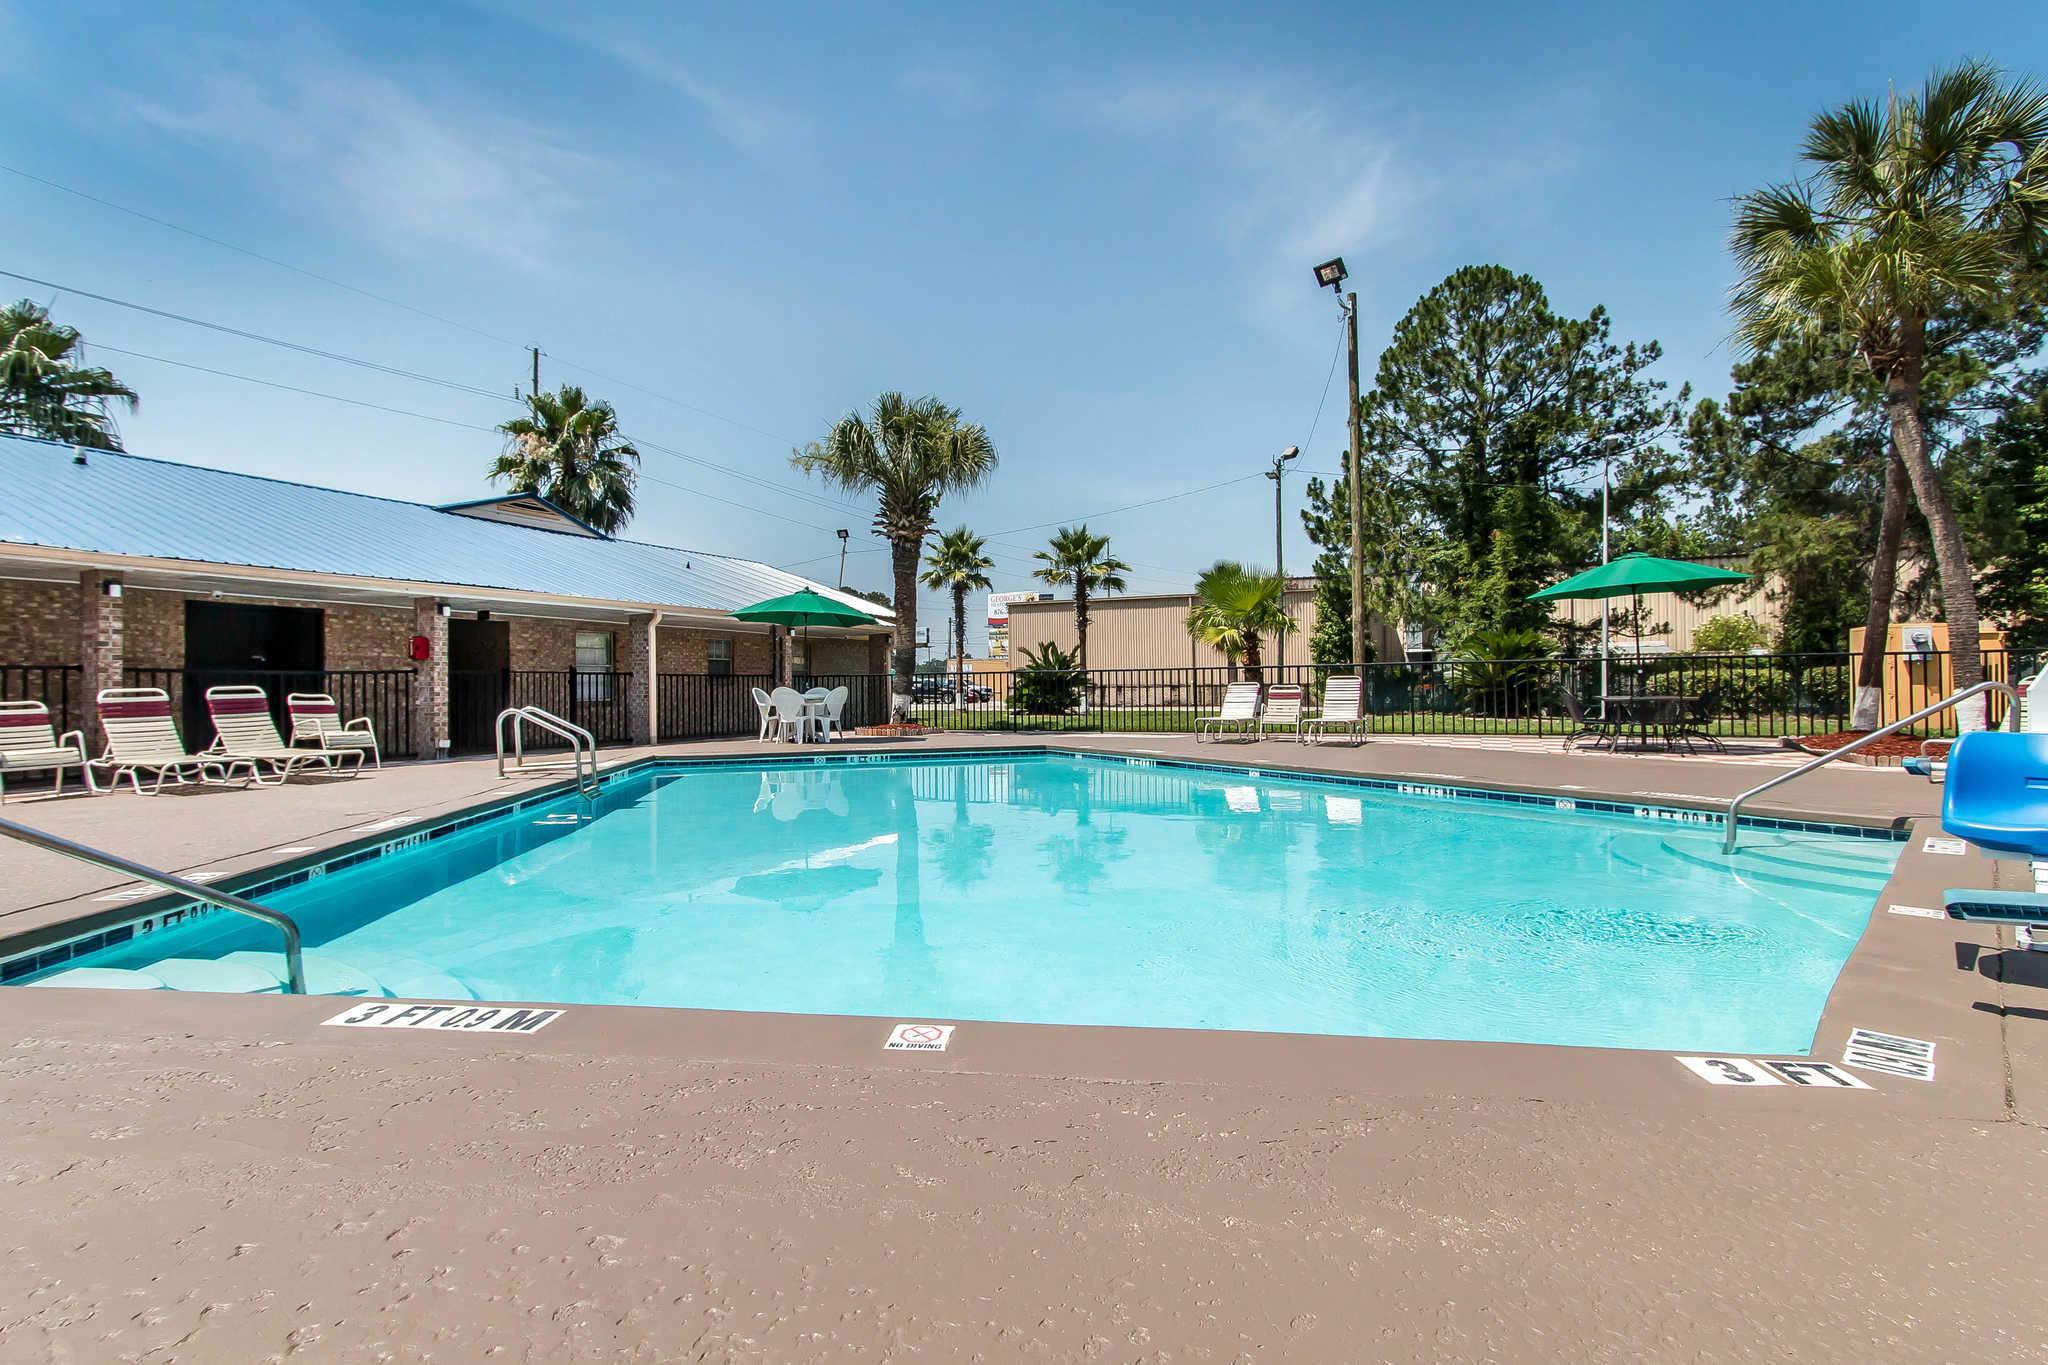 Quality Inn Hinesville - Fort Stewart Area image 24